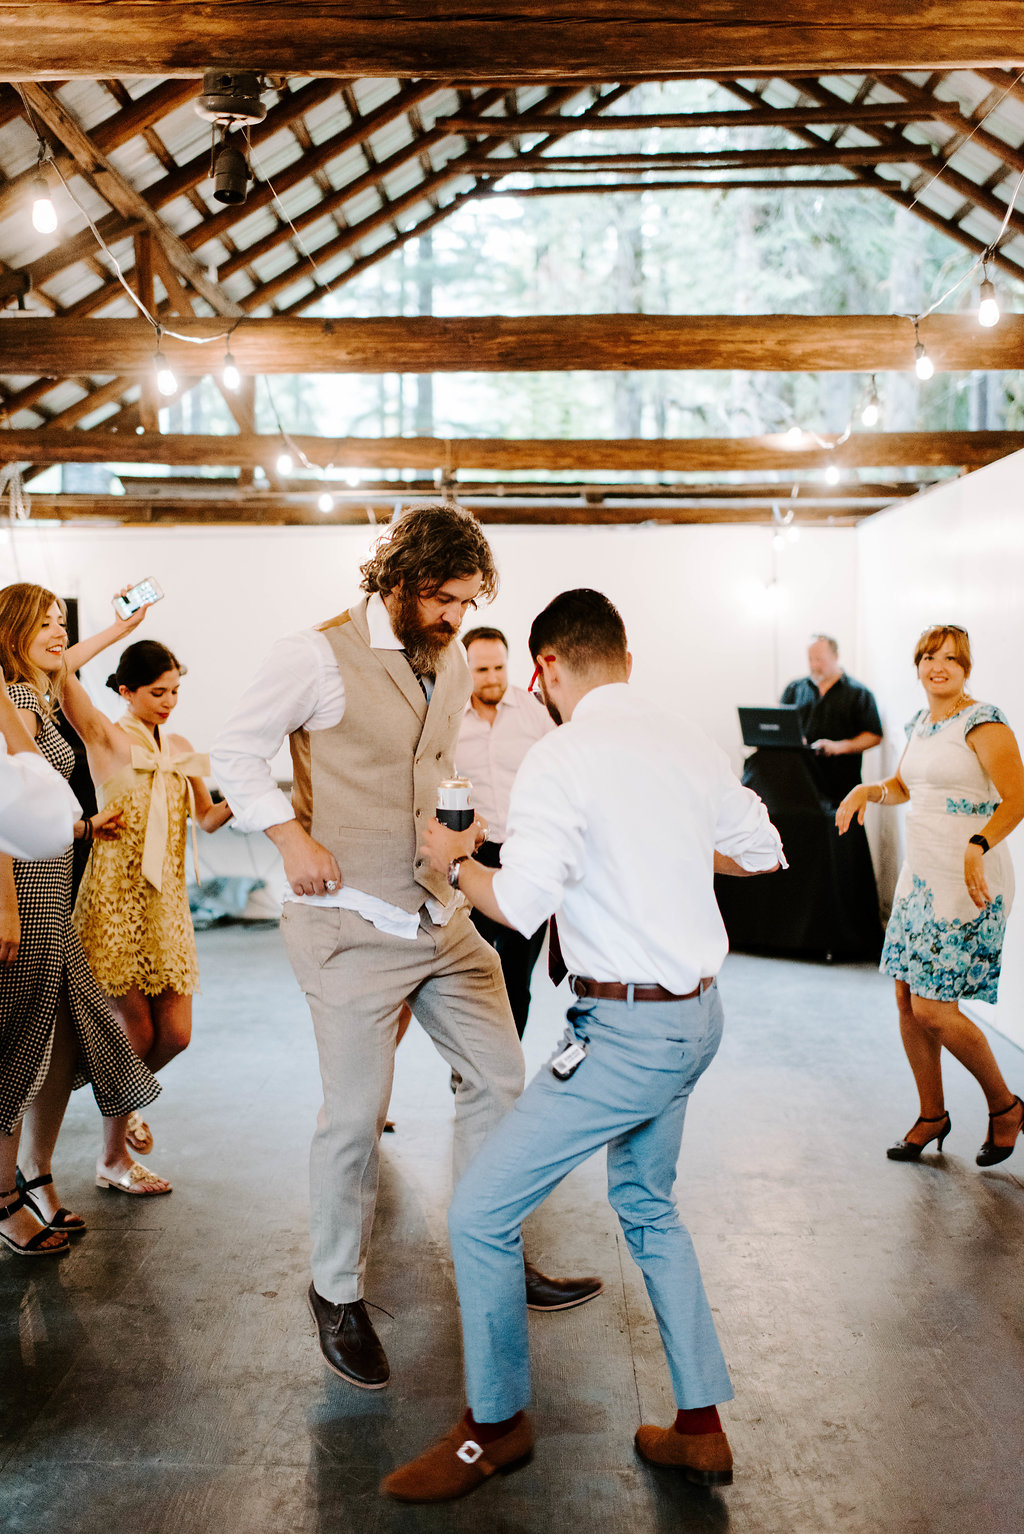 WE_dancing_-43.jpg